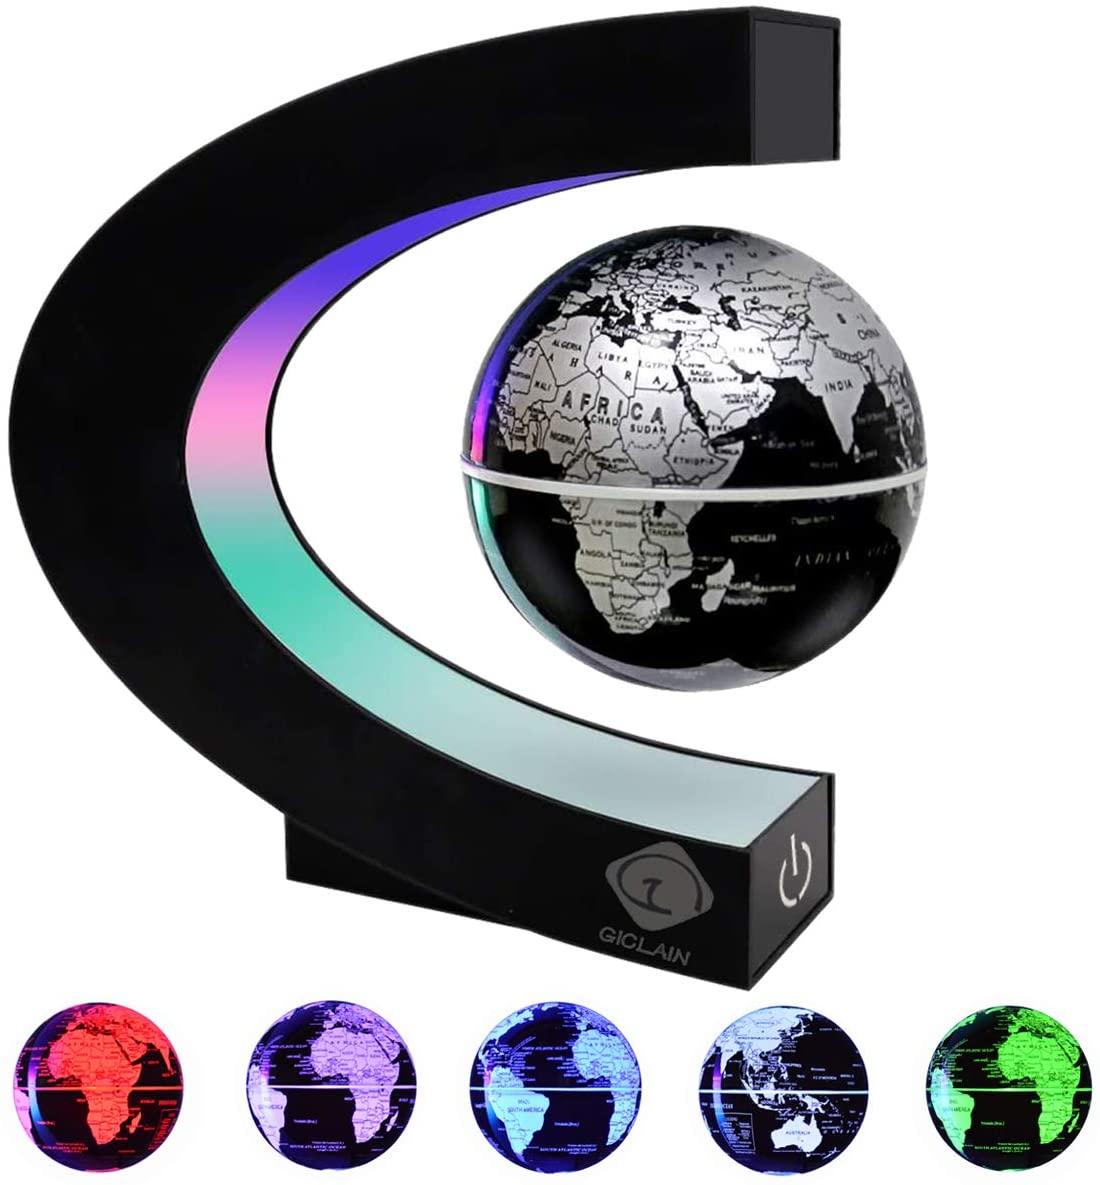 GICLAIN Floating Globe with LED Lights, Built in LED Illuminated C Shape Magnetic Levitation Globe World Map Unique Gifts for Home Office Desk Decoration Education Teaching Demo